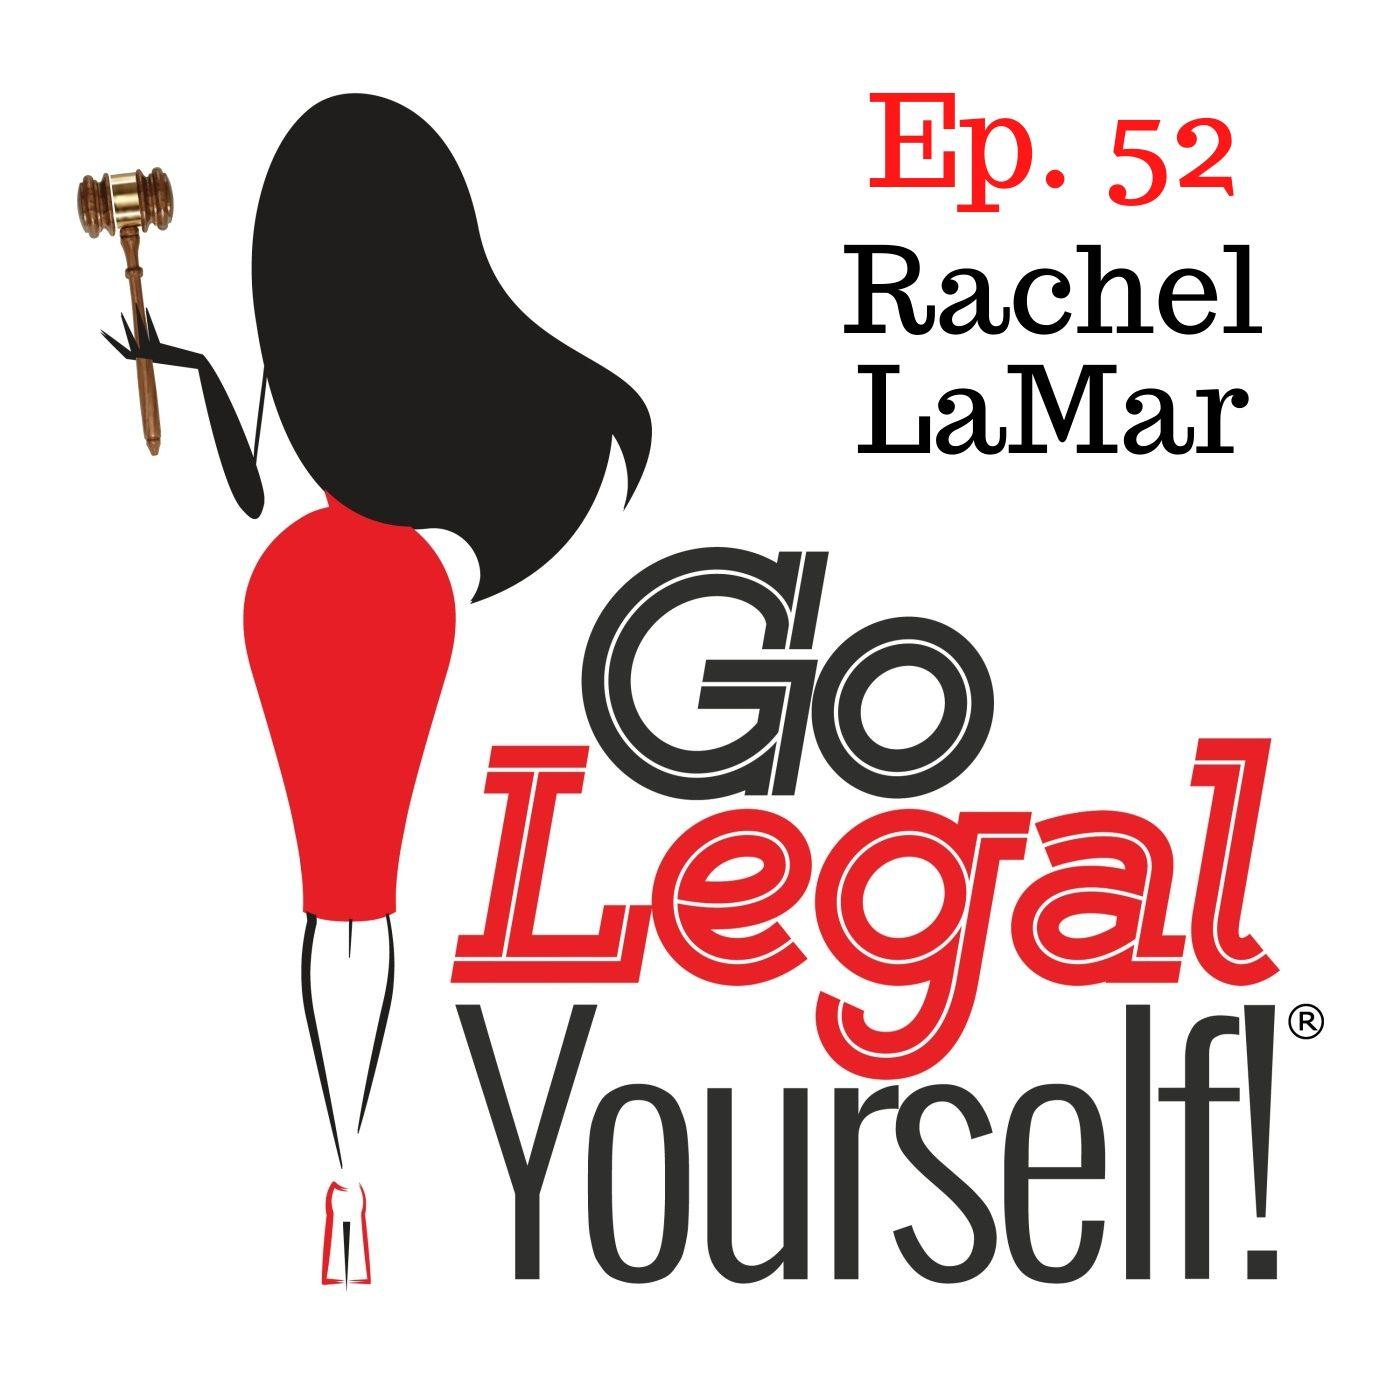 Ep. 52 Rachel LaMar: Celebrating 17-Years in Business